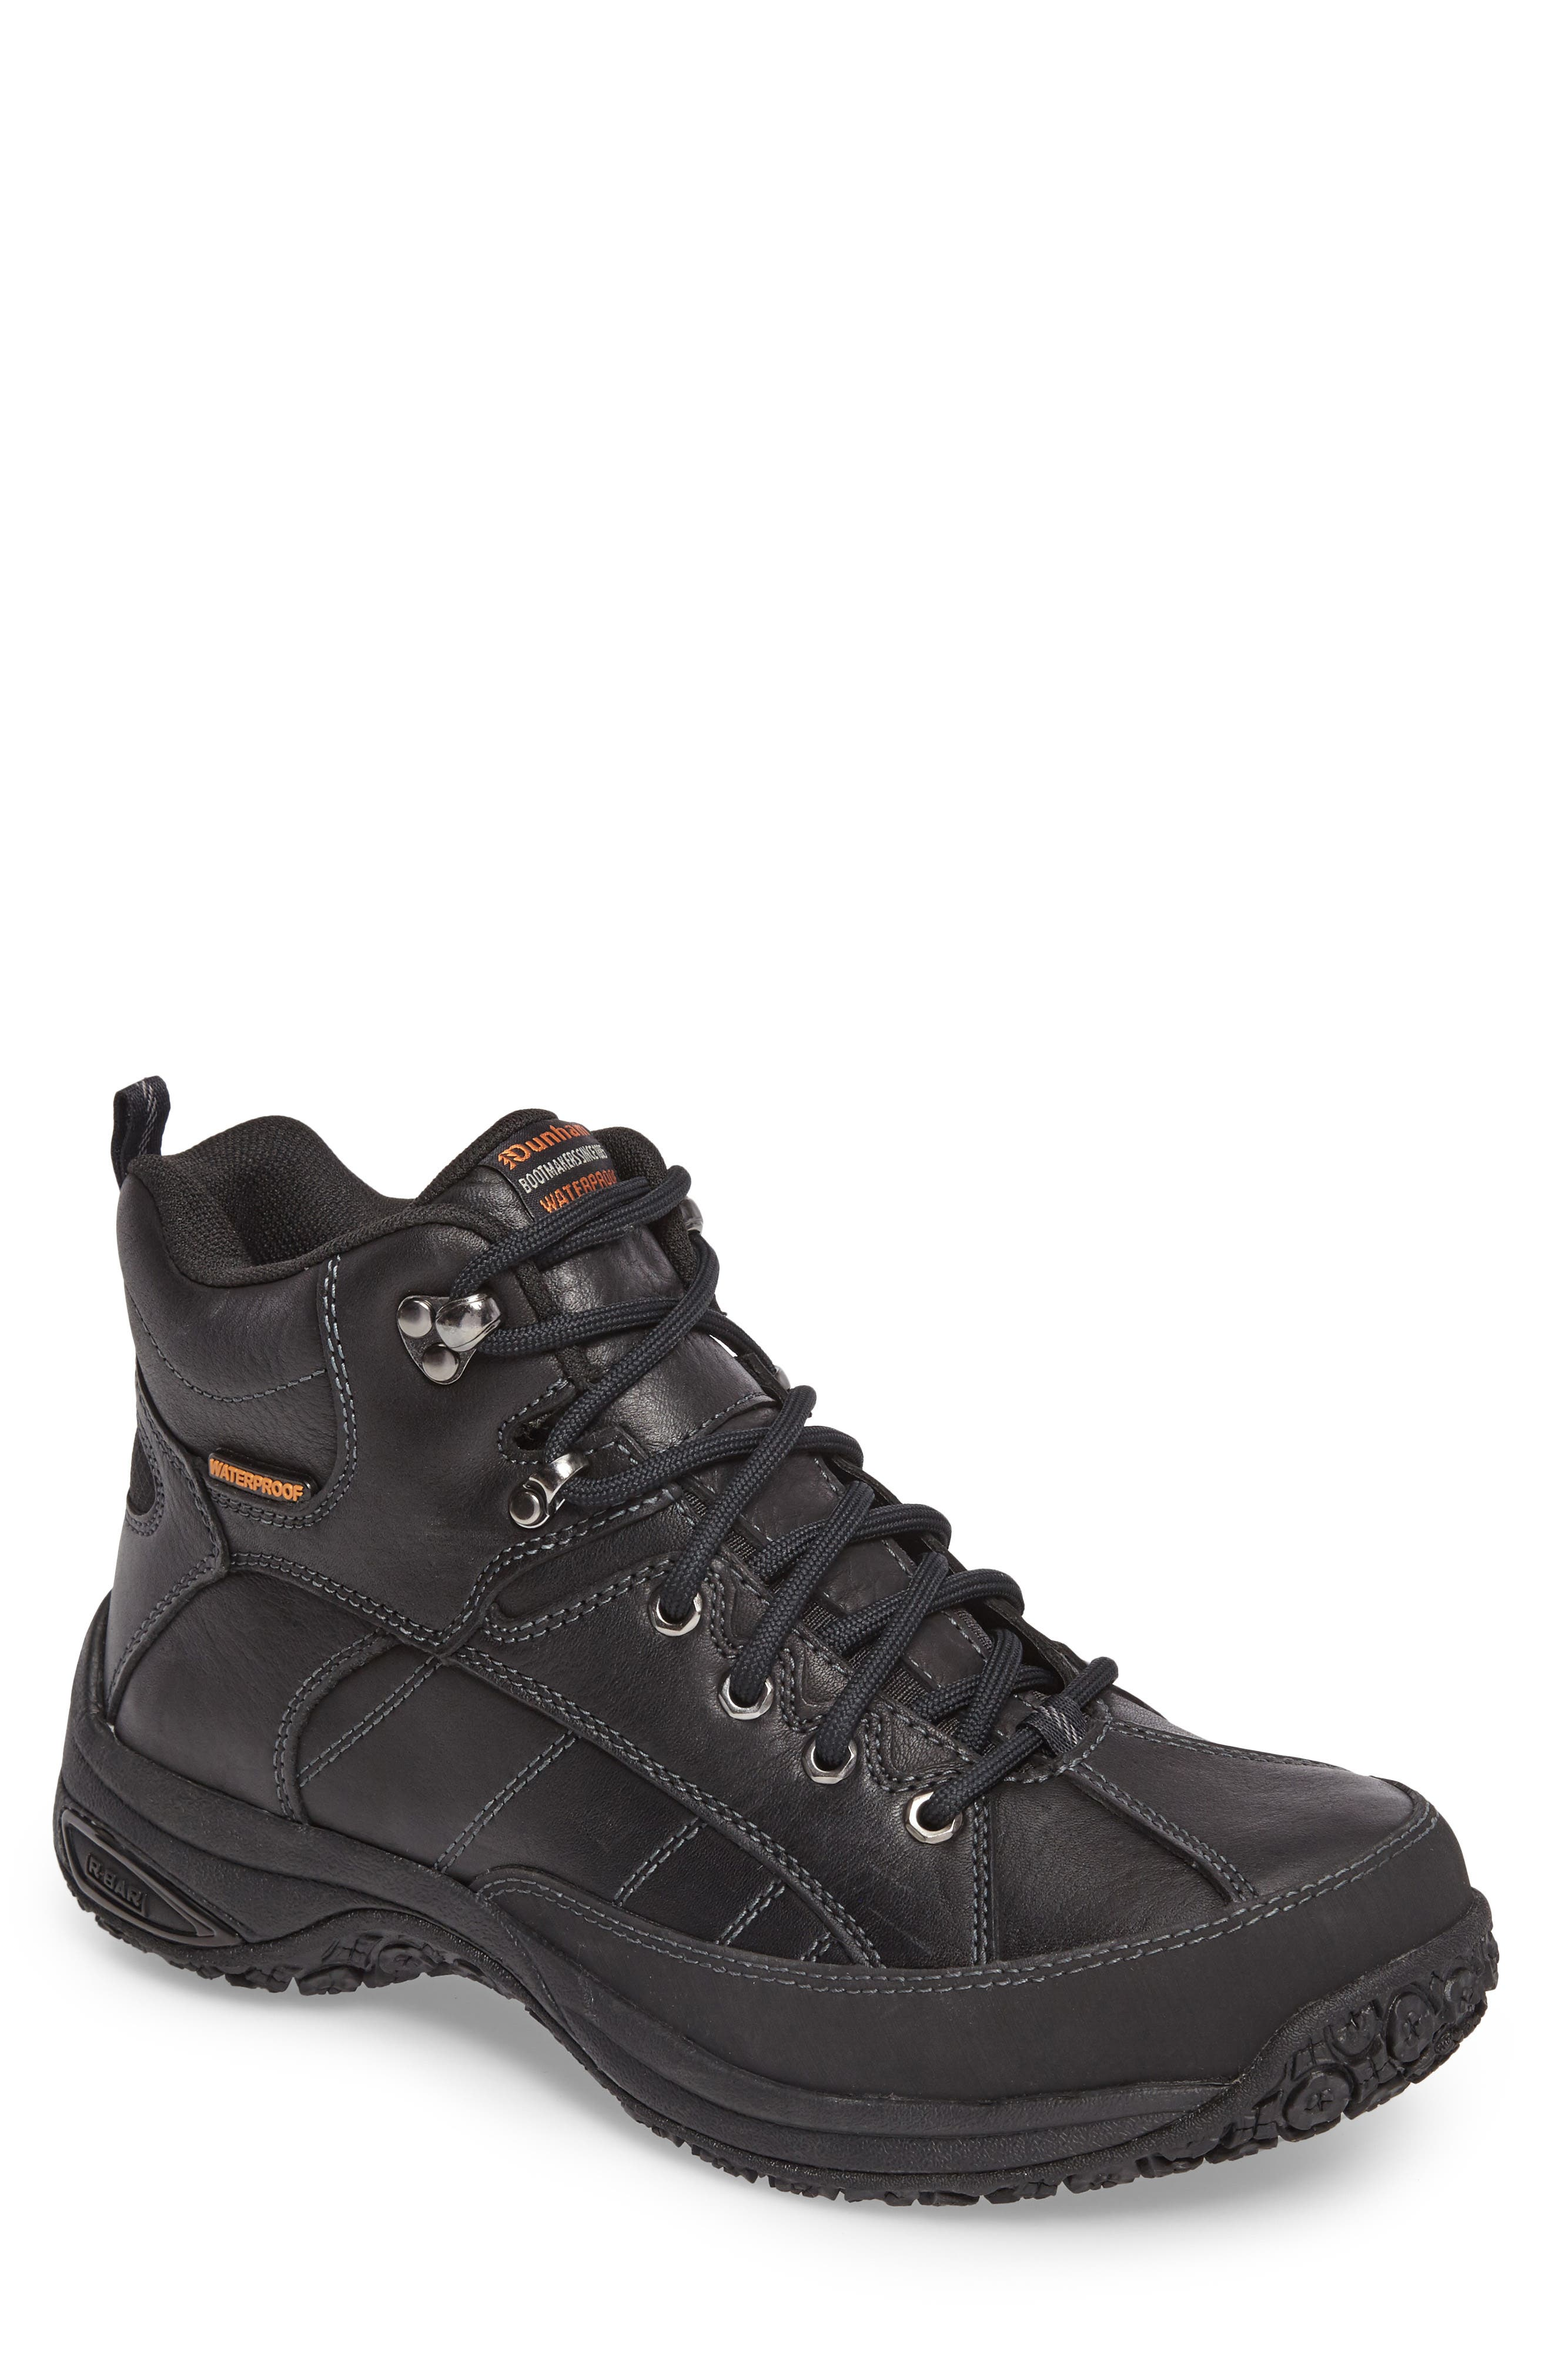 Dunham Lawrence Waterproof Boot, Black